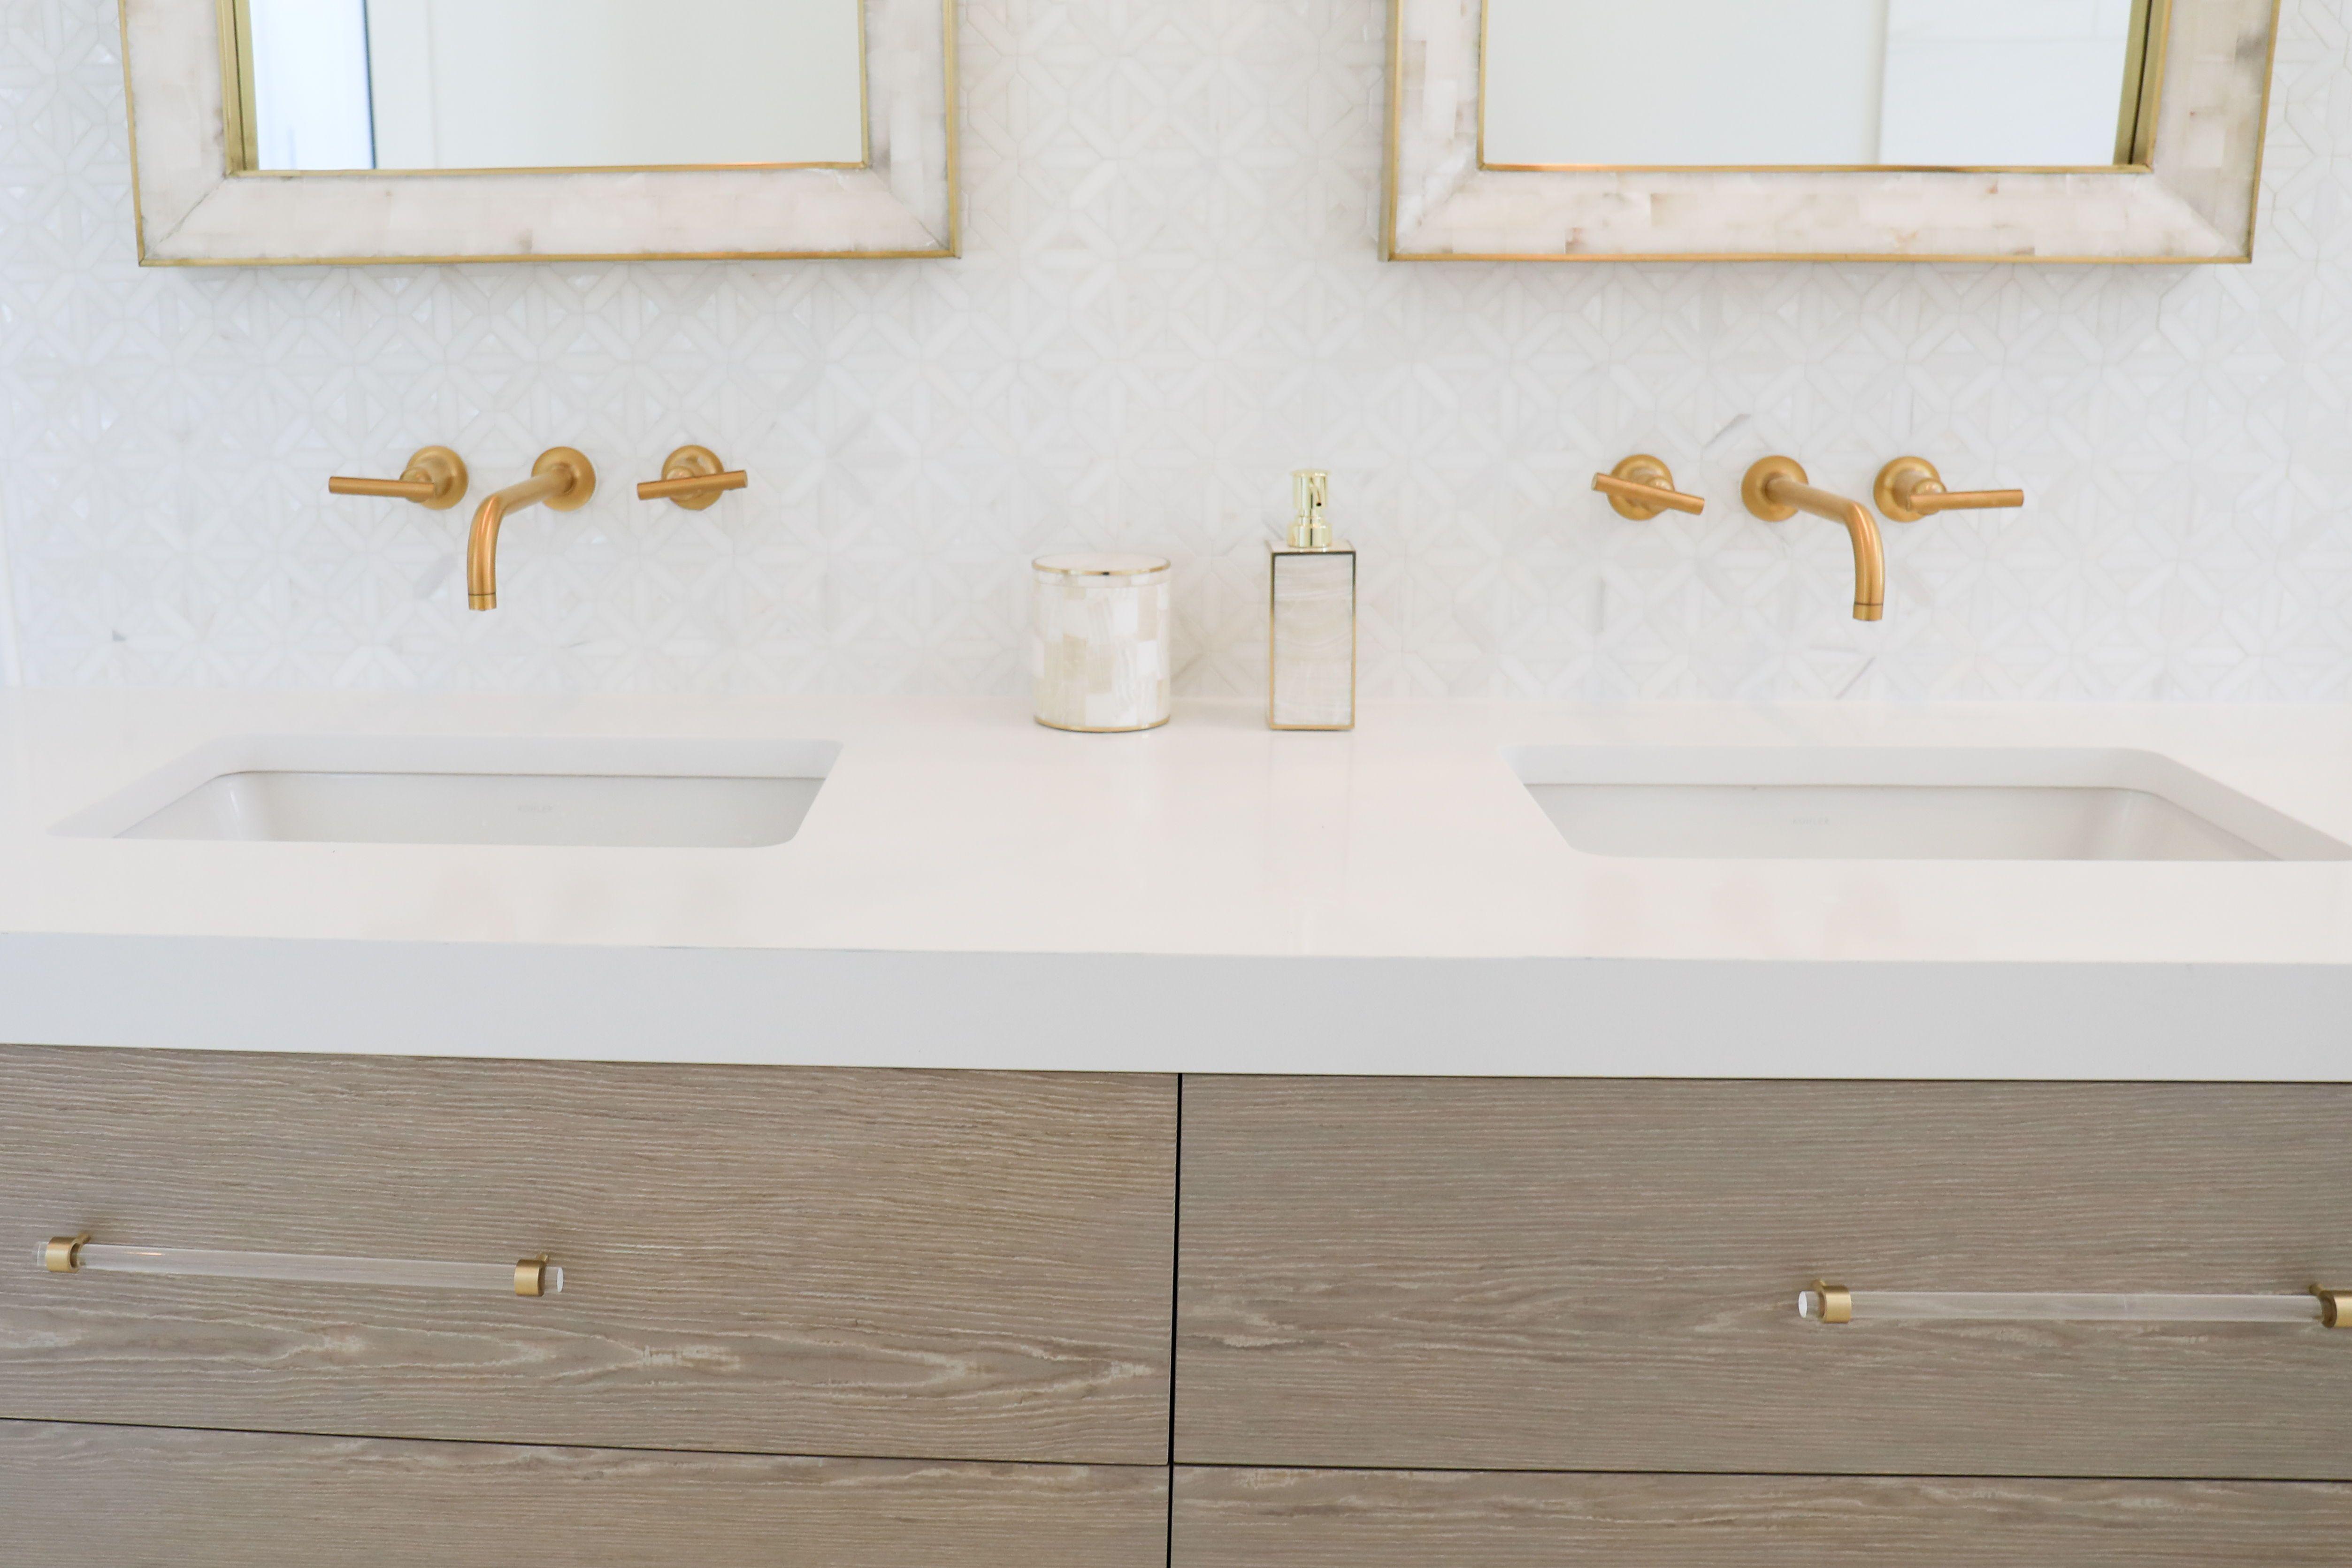 Lucite Drawer Pulls Crown Post 3 4 Dia Polished Brass Or Satin Brass Lucite Drawer Handles Luc Drawer Handles Cabinet Handles Bathroom Hardware [ 3341 x 5011 Pixel ]